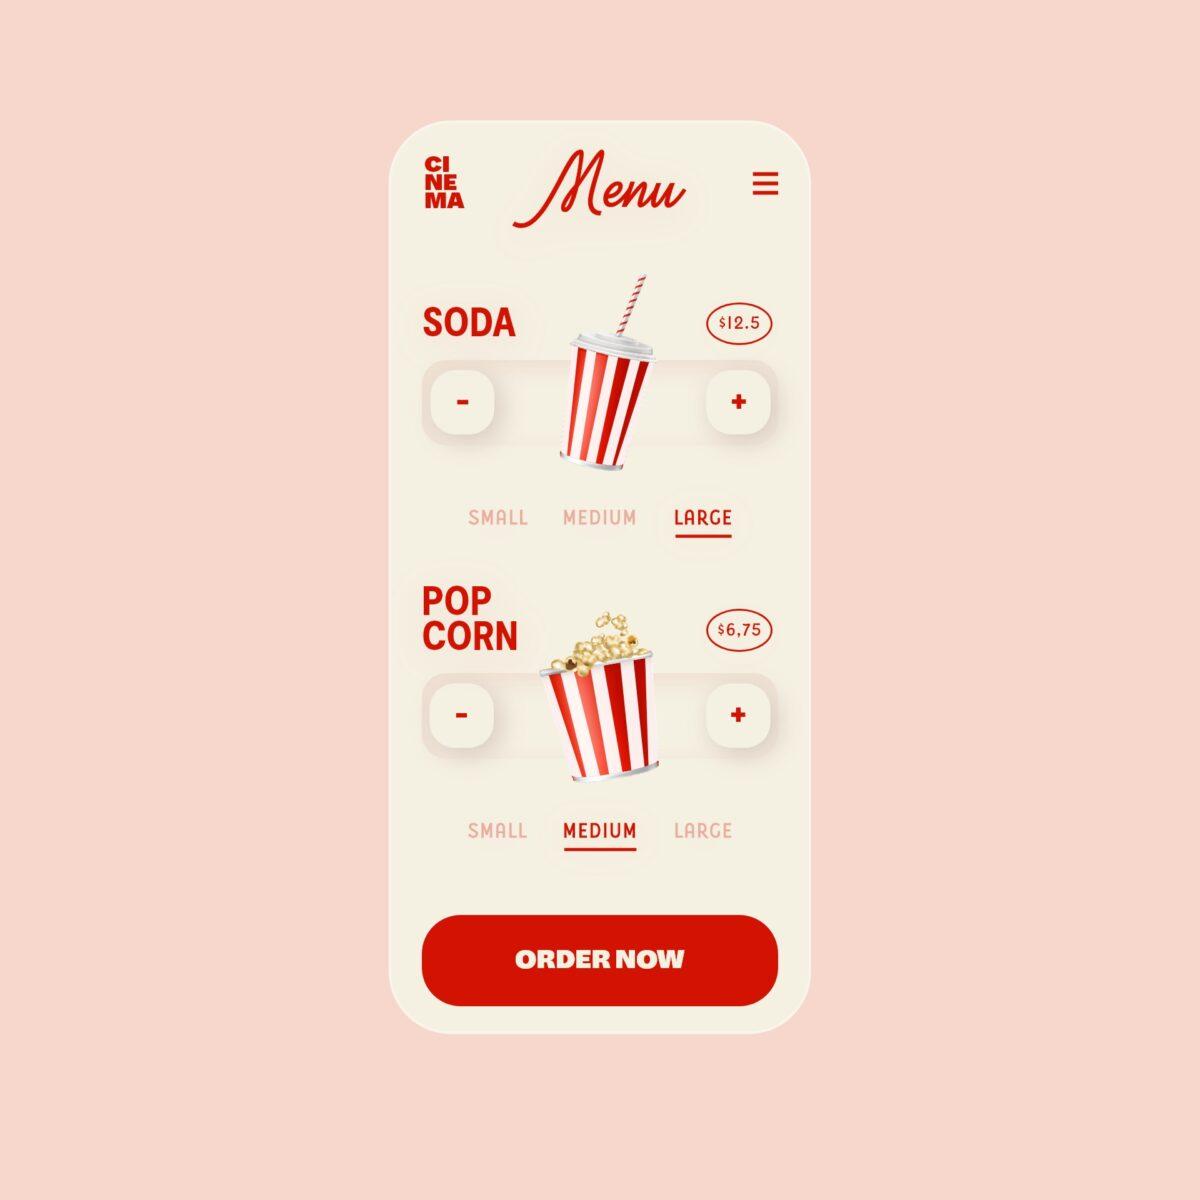 Cinema food and drink menu concept design